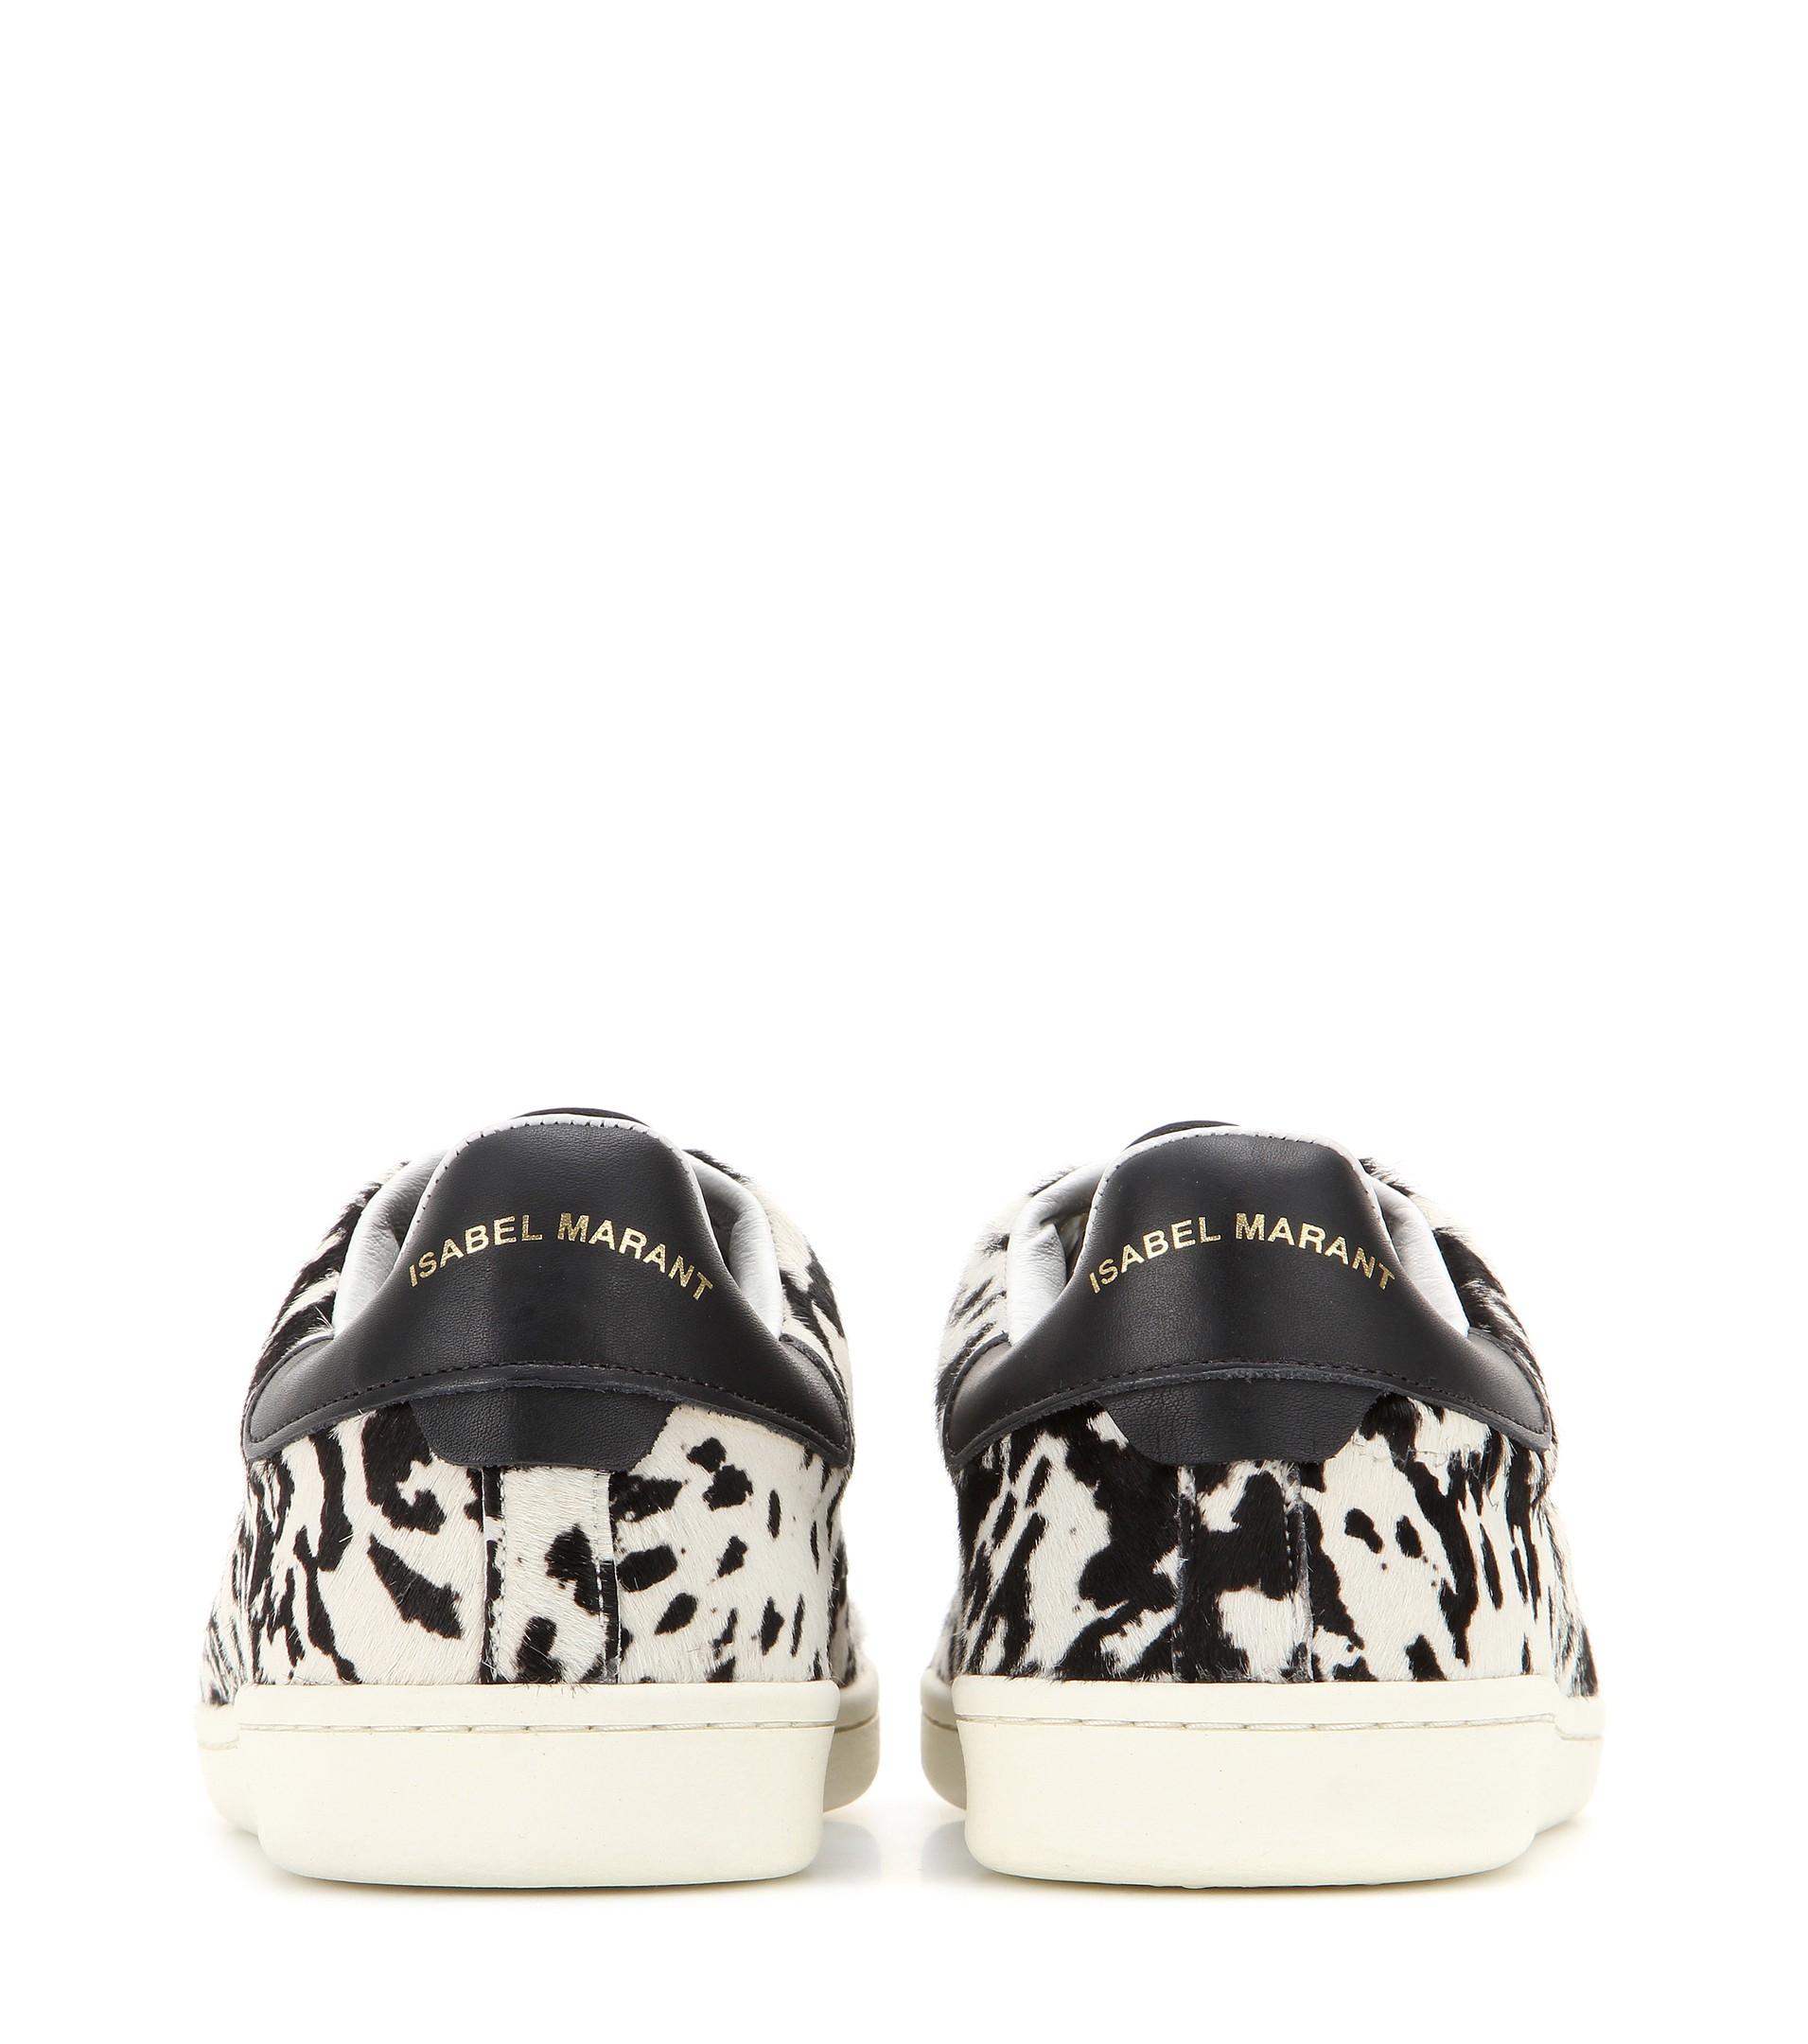 5fff2c19ea34 Isabel Marant Étoile Bart Calf Hair Sneakers in Black - Lyst